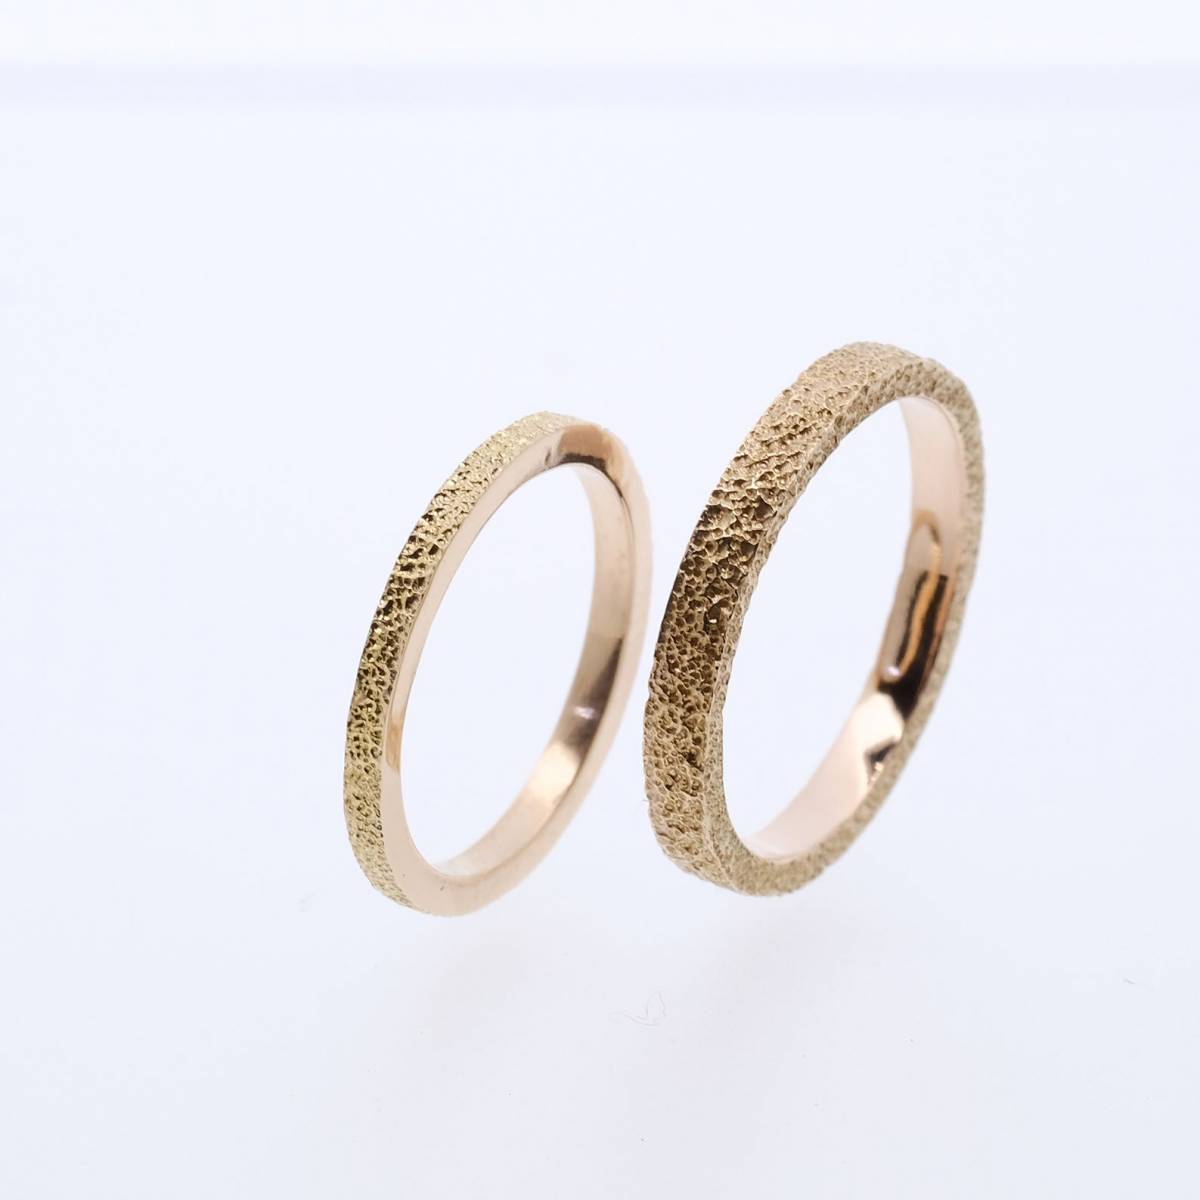 Jonas Maes Jewels - Juwelen - Bruidsjuwelen - Verlovingsring - Trouwring - House of Weddings - 7